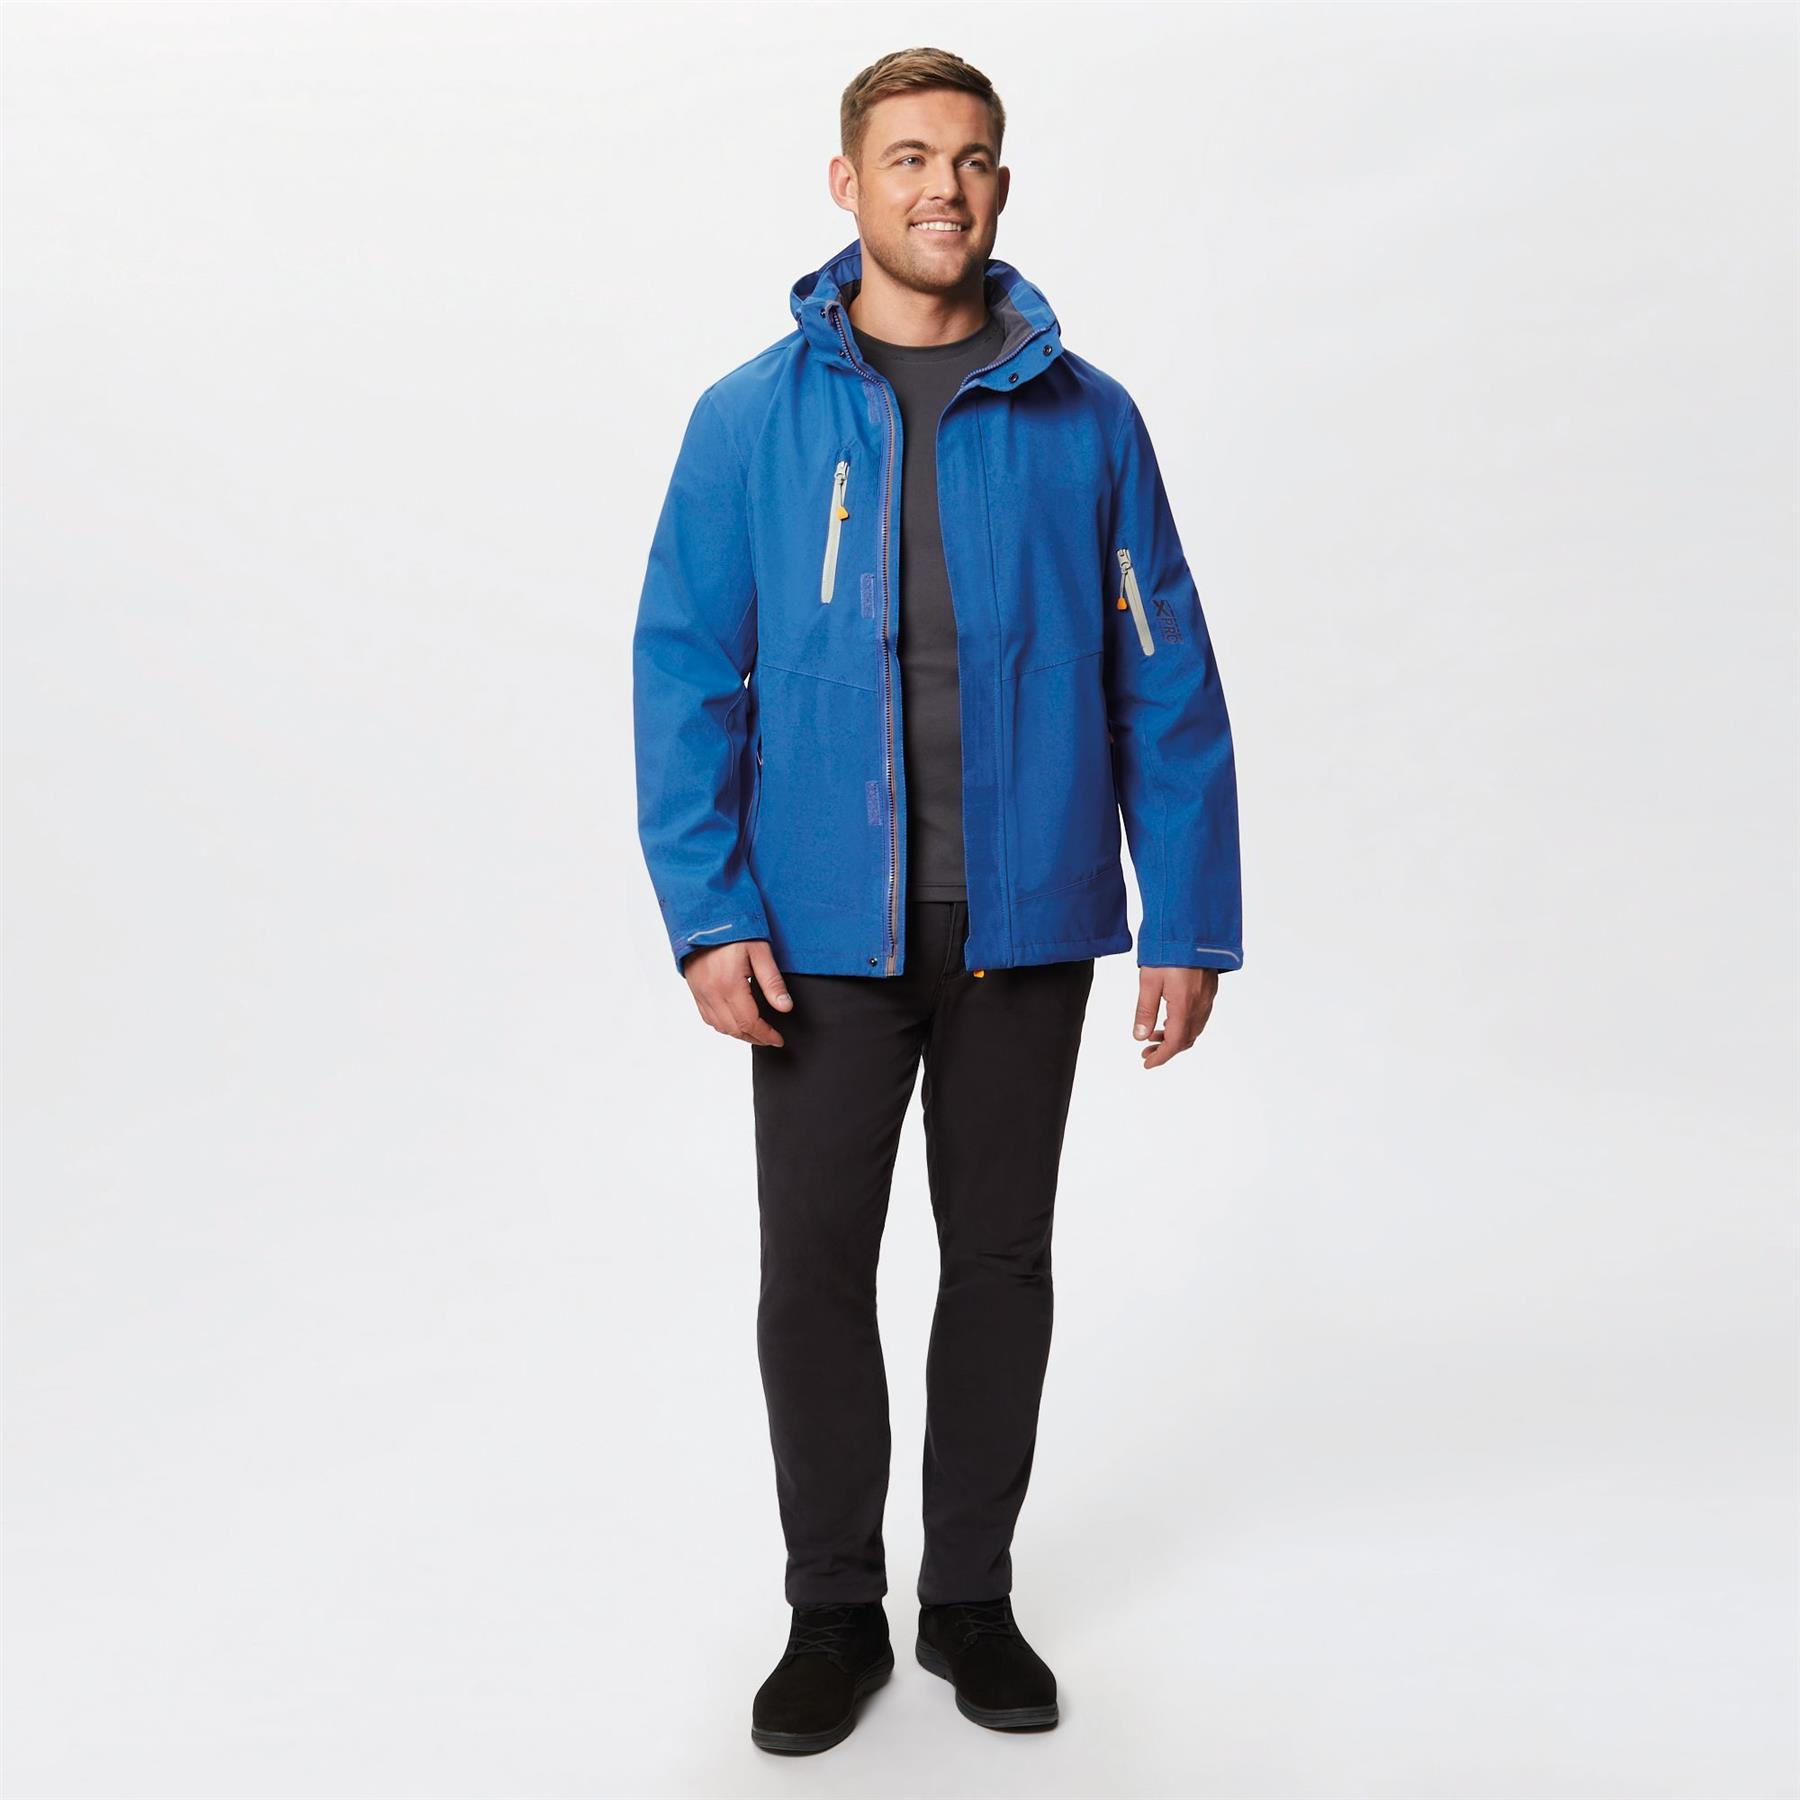 miniatuur 9 - Regatta Mens X-Pro Exosphere Stretch Waterproof Hooded Jacket